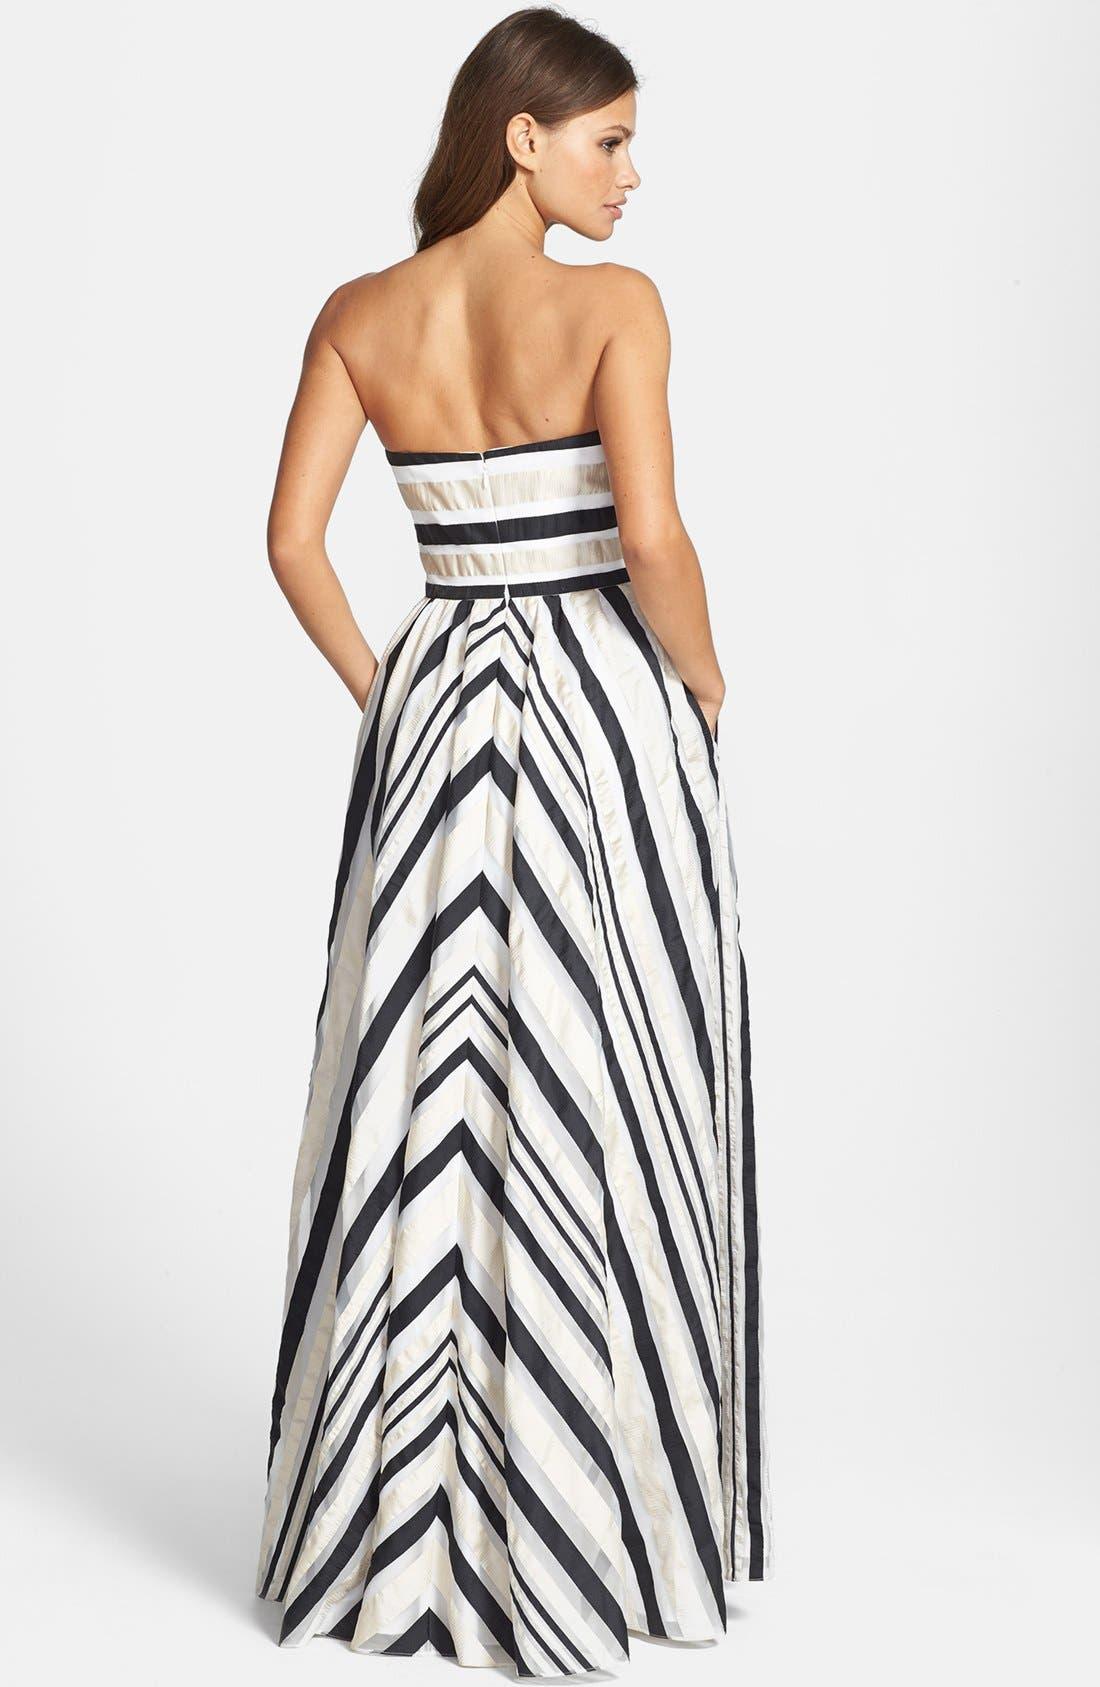 Ribbon Stripe Strapless Dress,                             Alternate thumbnail 2, color,                             001